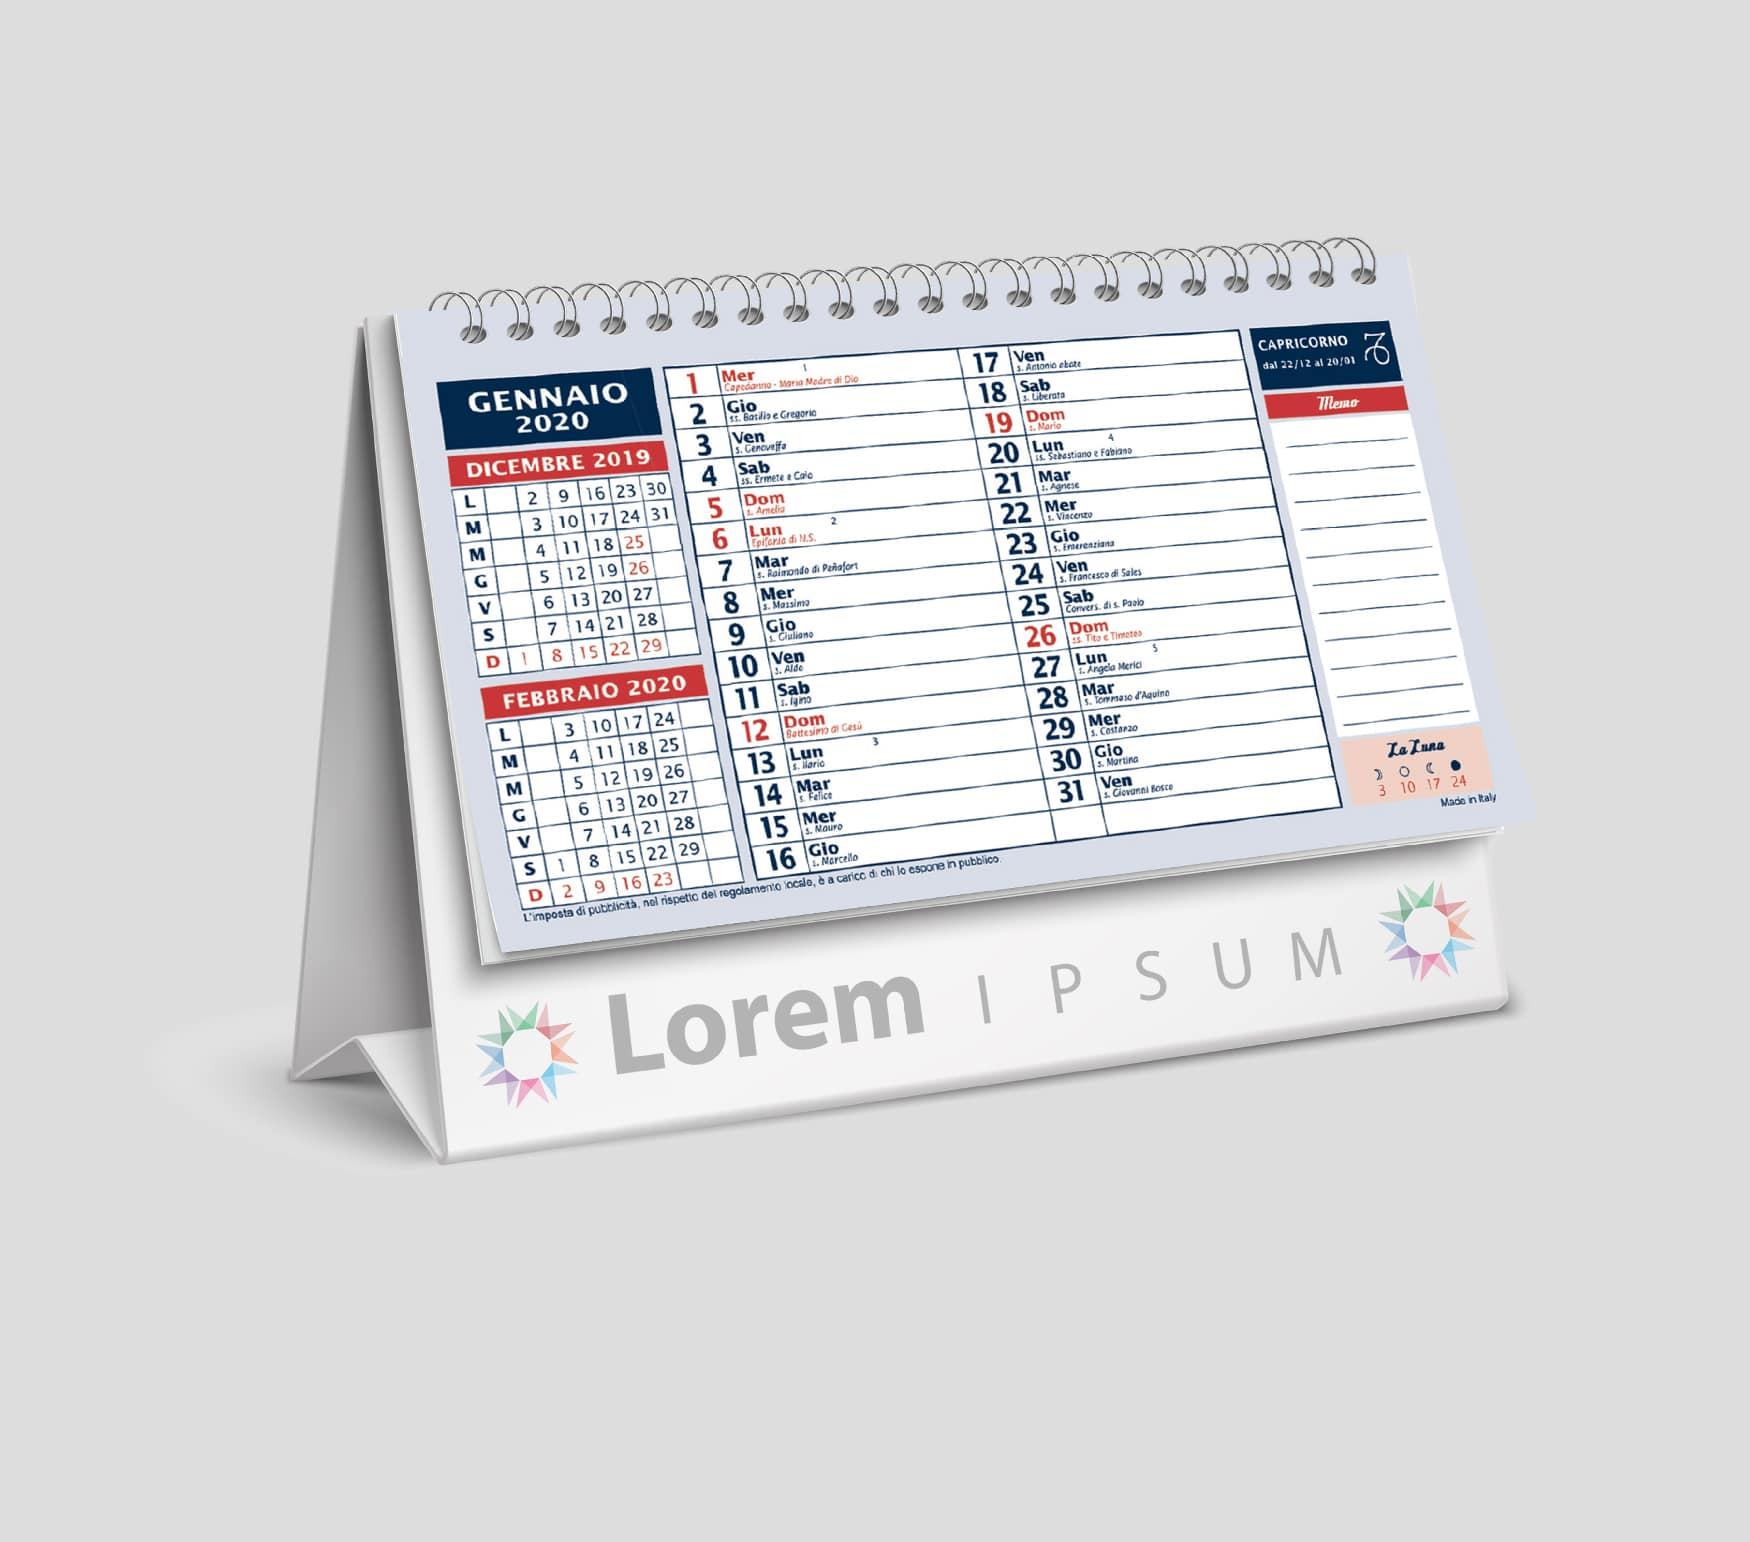 Calendario Olandese Da Stampare.Stampa Calendari Olandesi